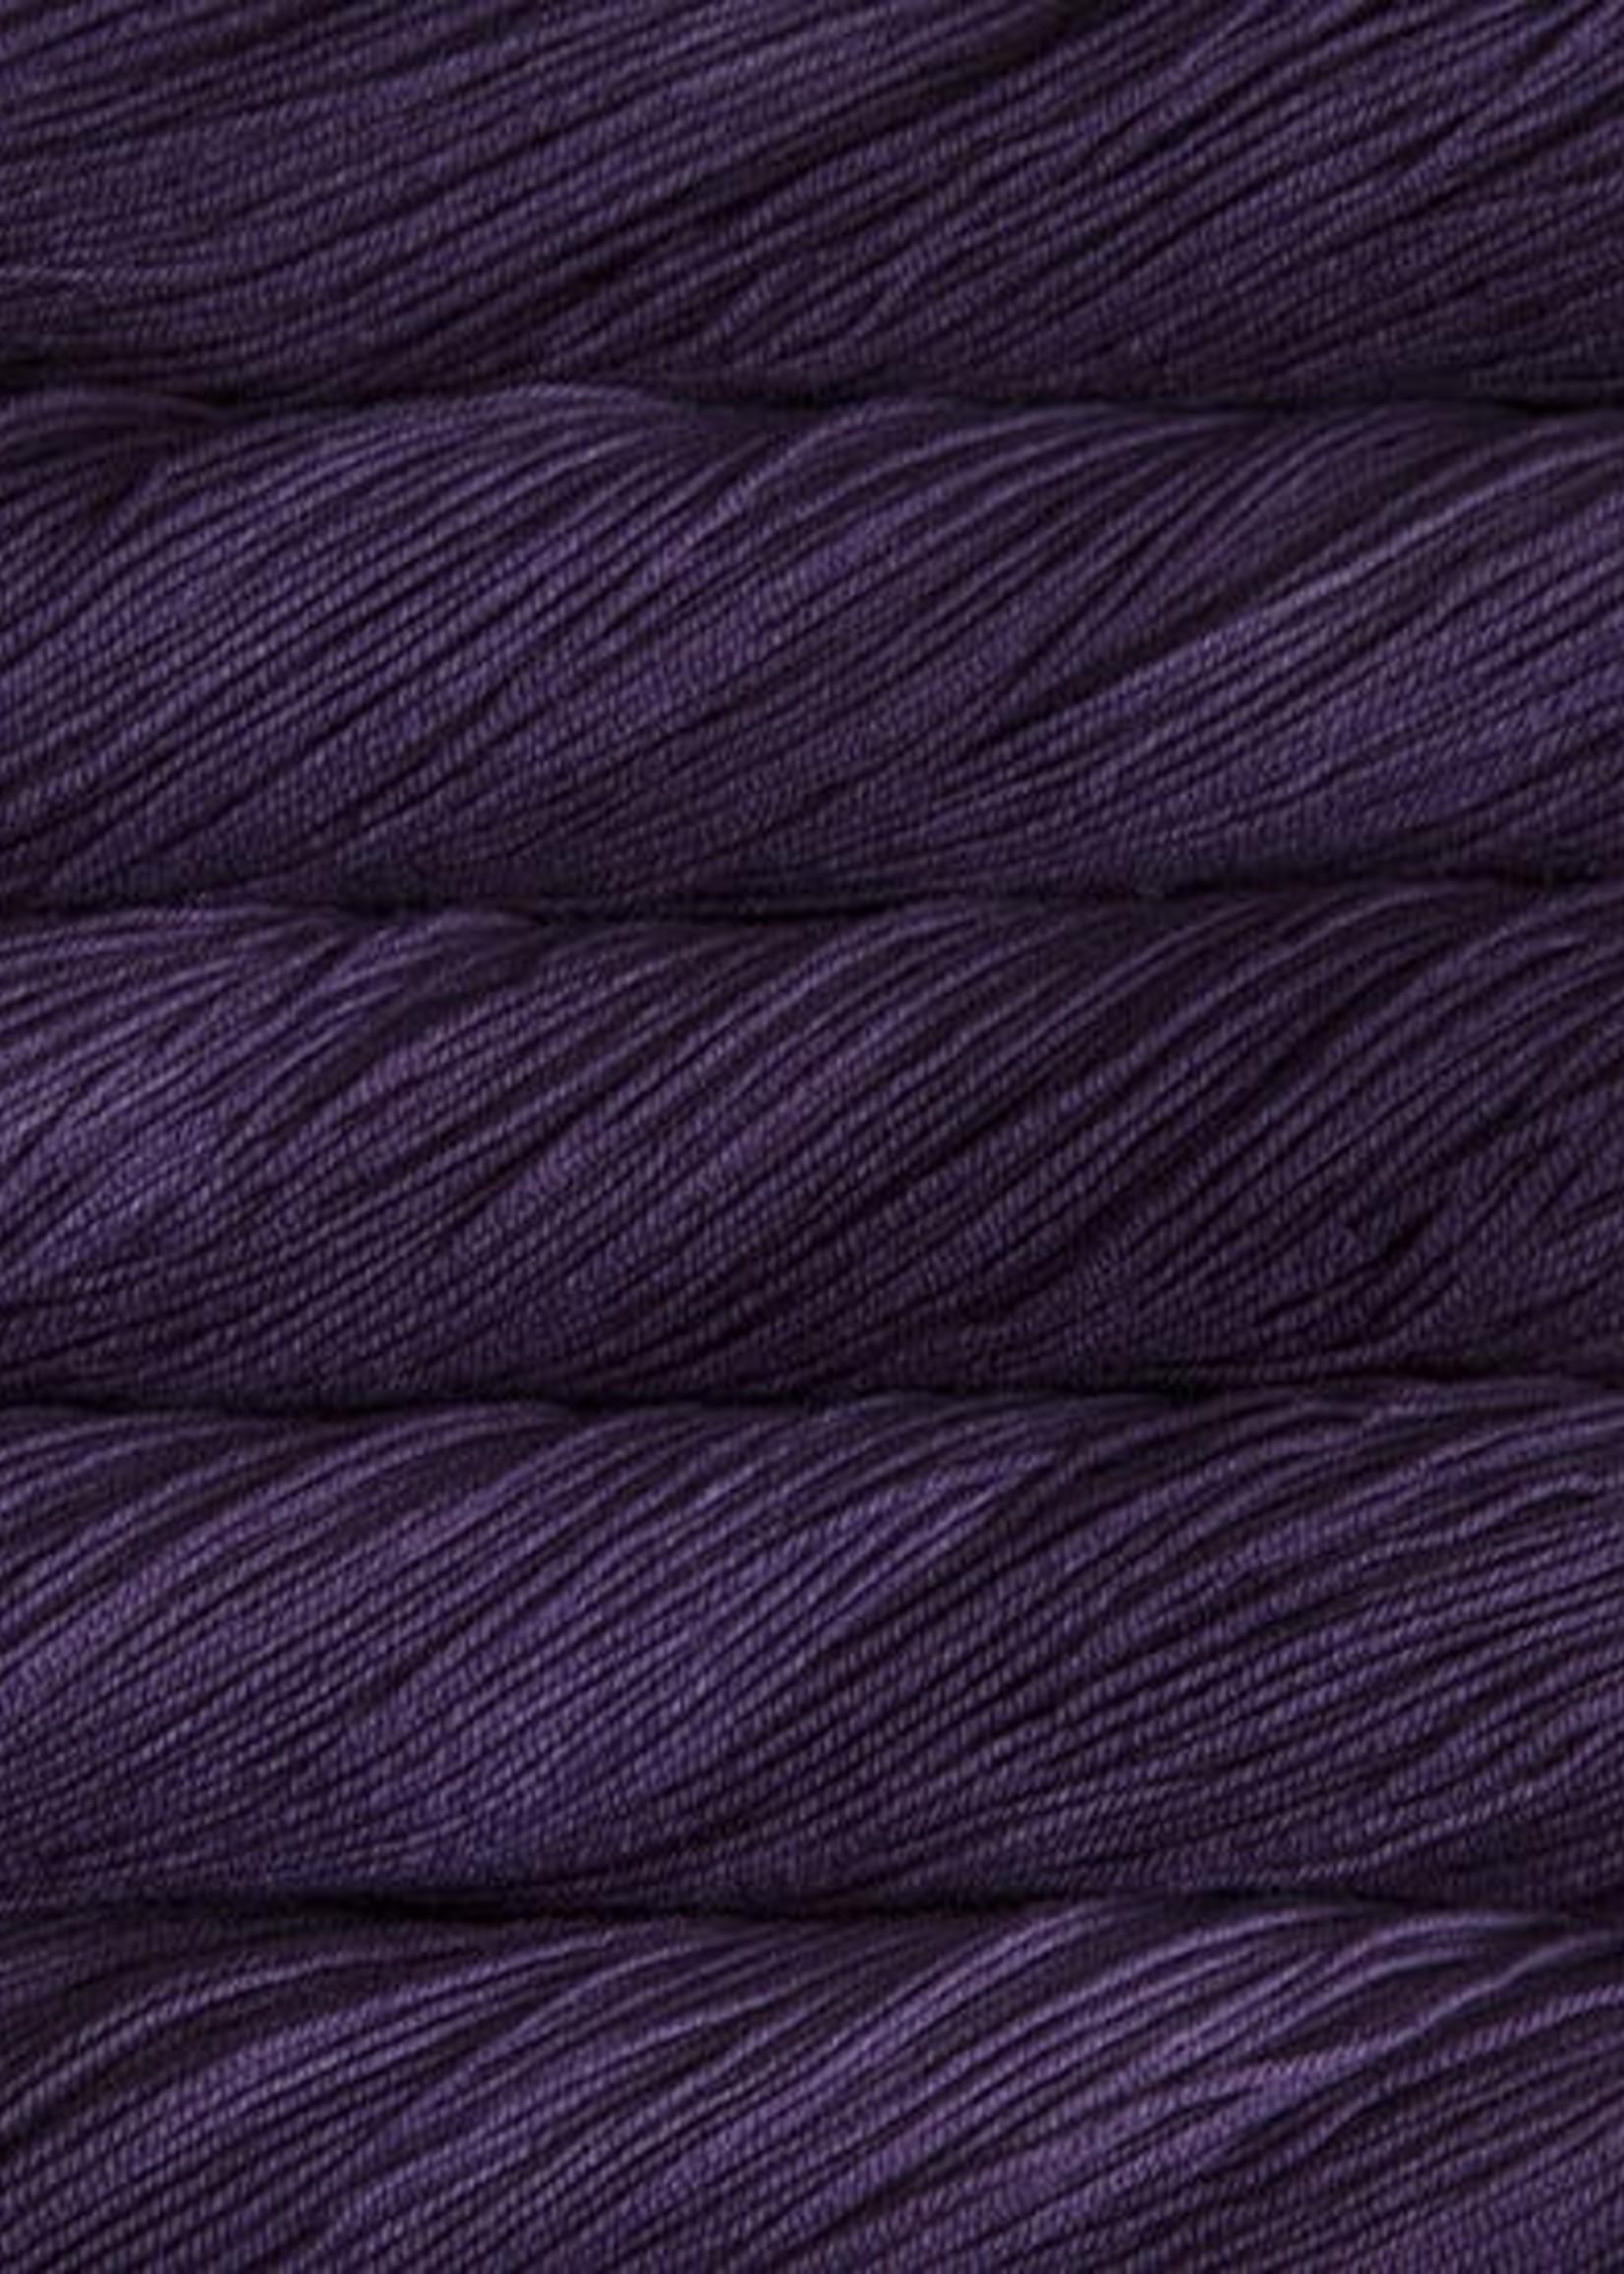 Malabrigo Yarn Malabrigo Sock Yarn #808 Violeta Africana